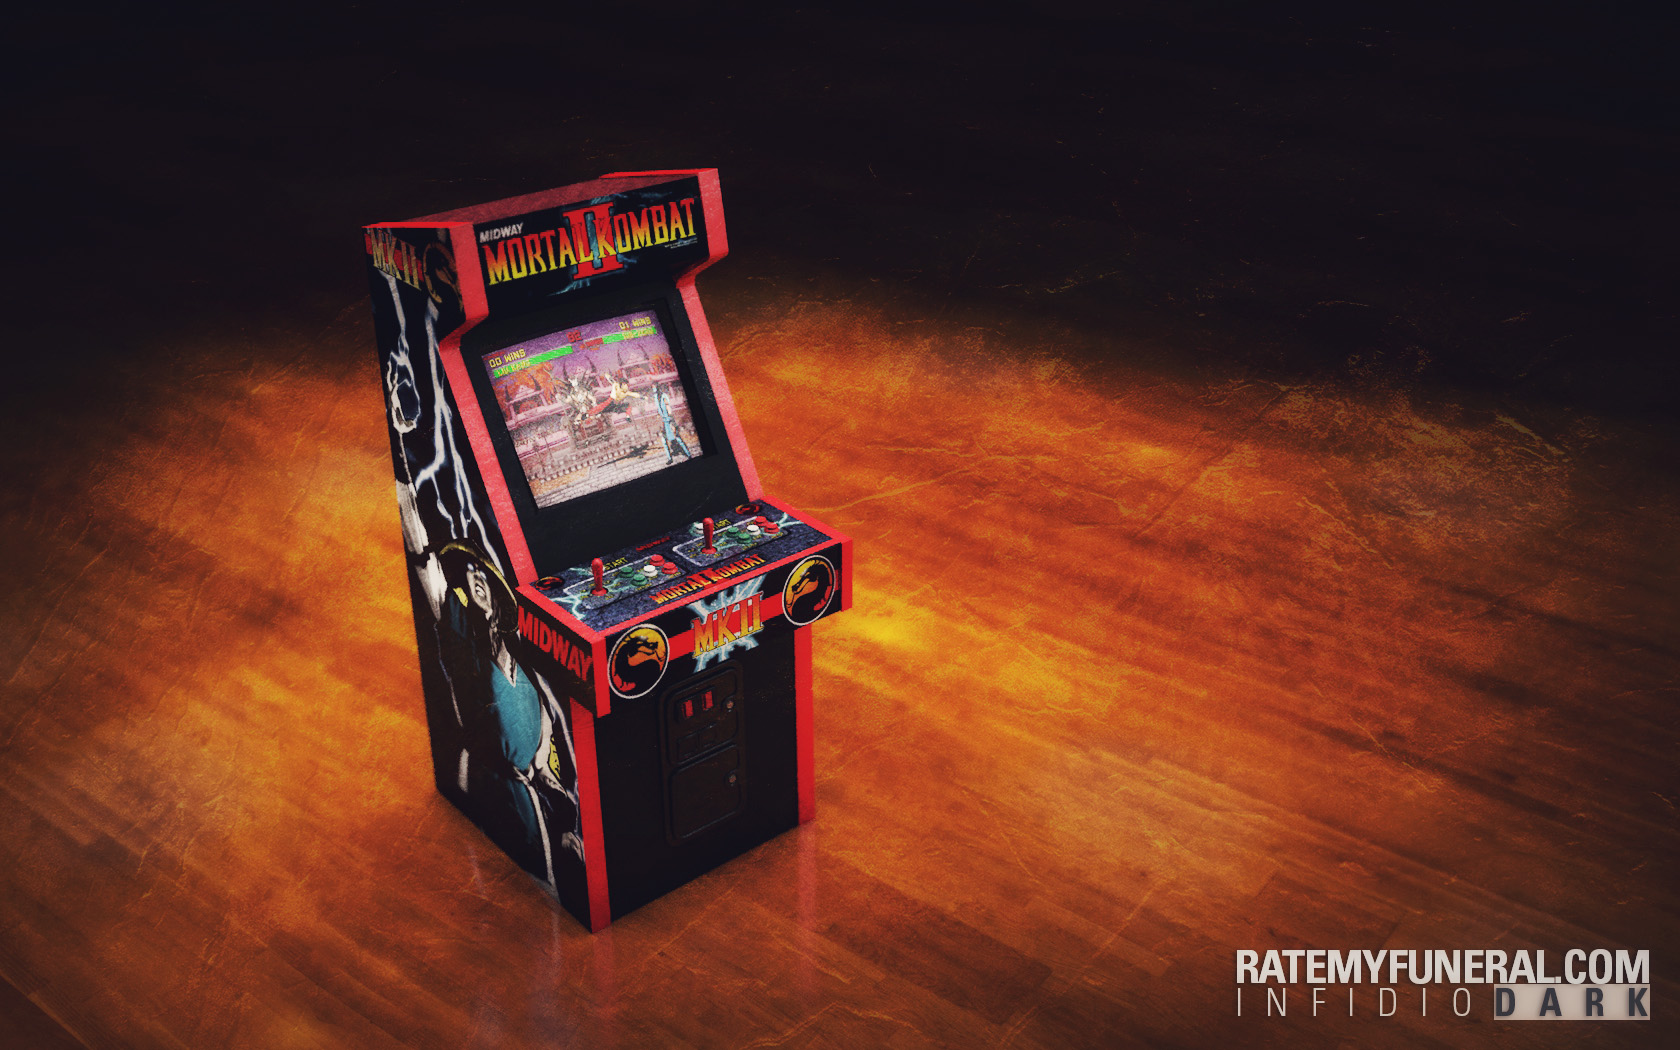 Cinema 4D Tutorial + Free Arcade Cabinet Model | Rate My Funeral